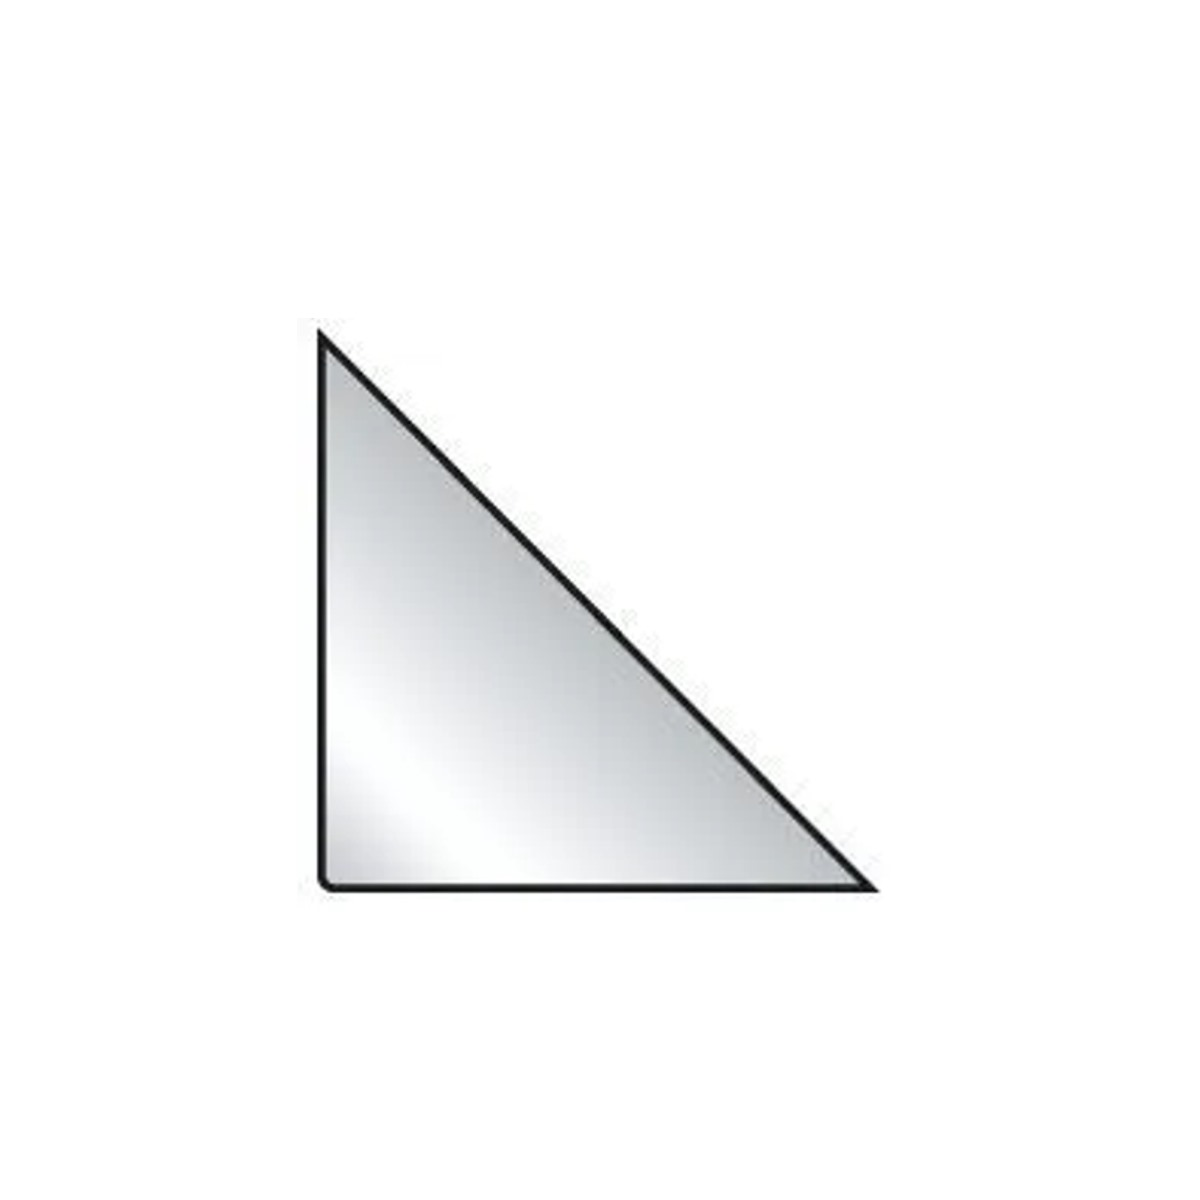 Bolsas Auto Adesivas Triangular - Porta Arquivos 75x75mm